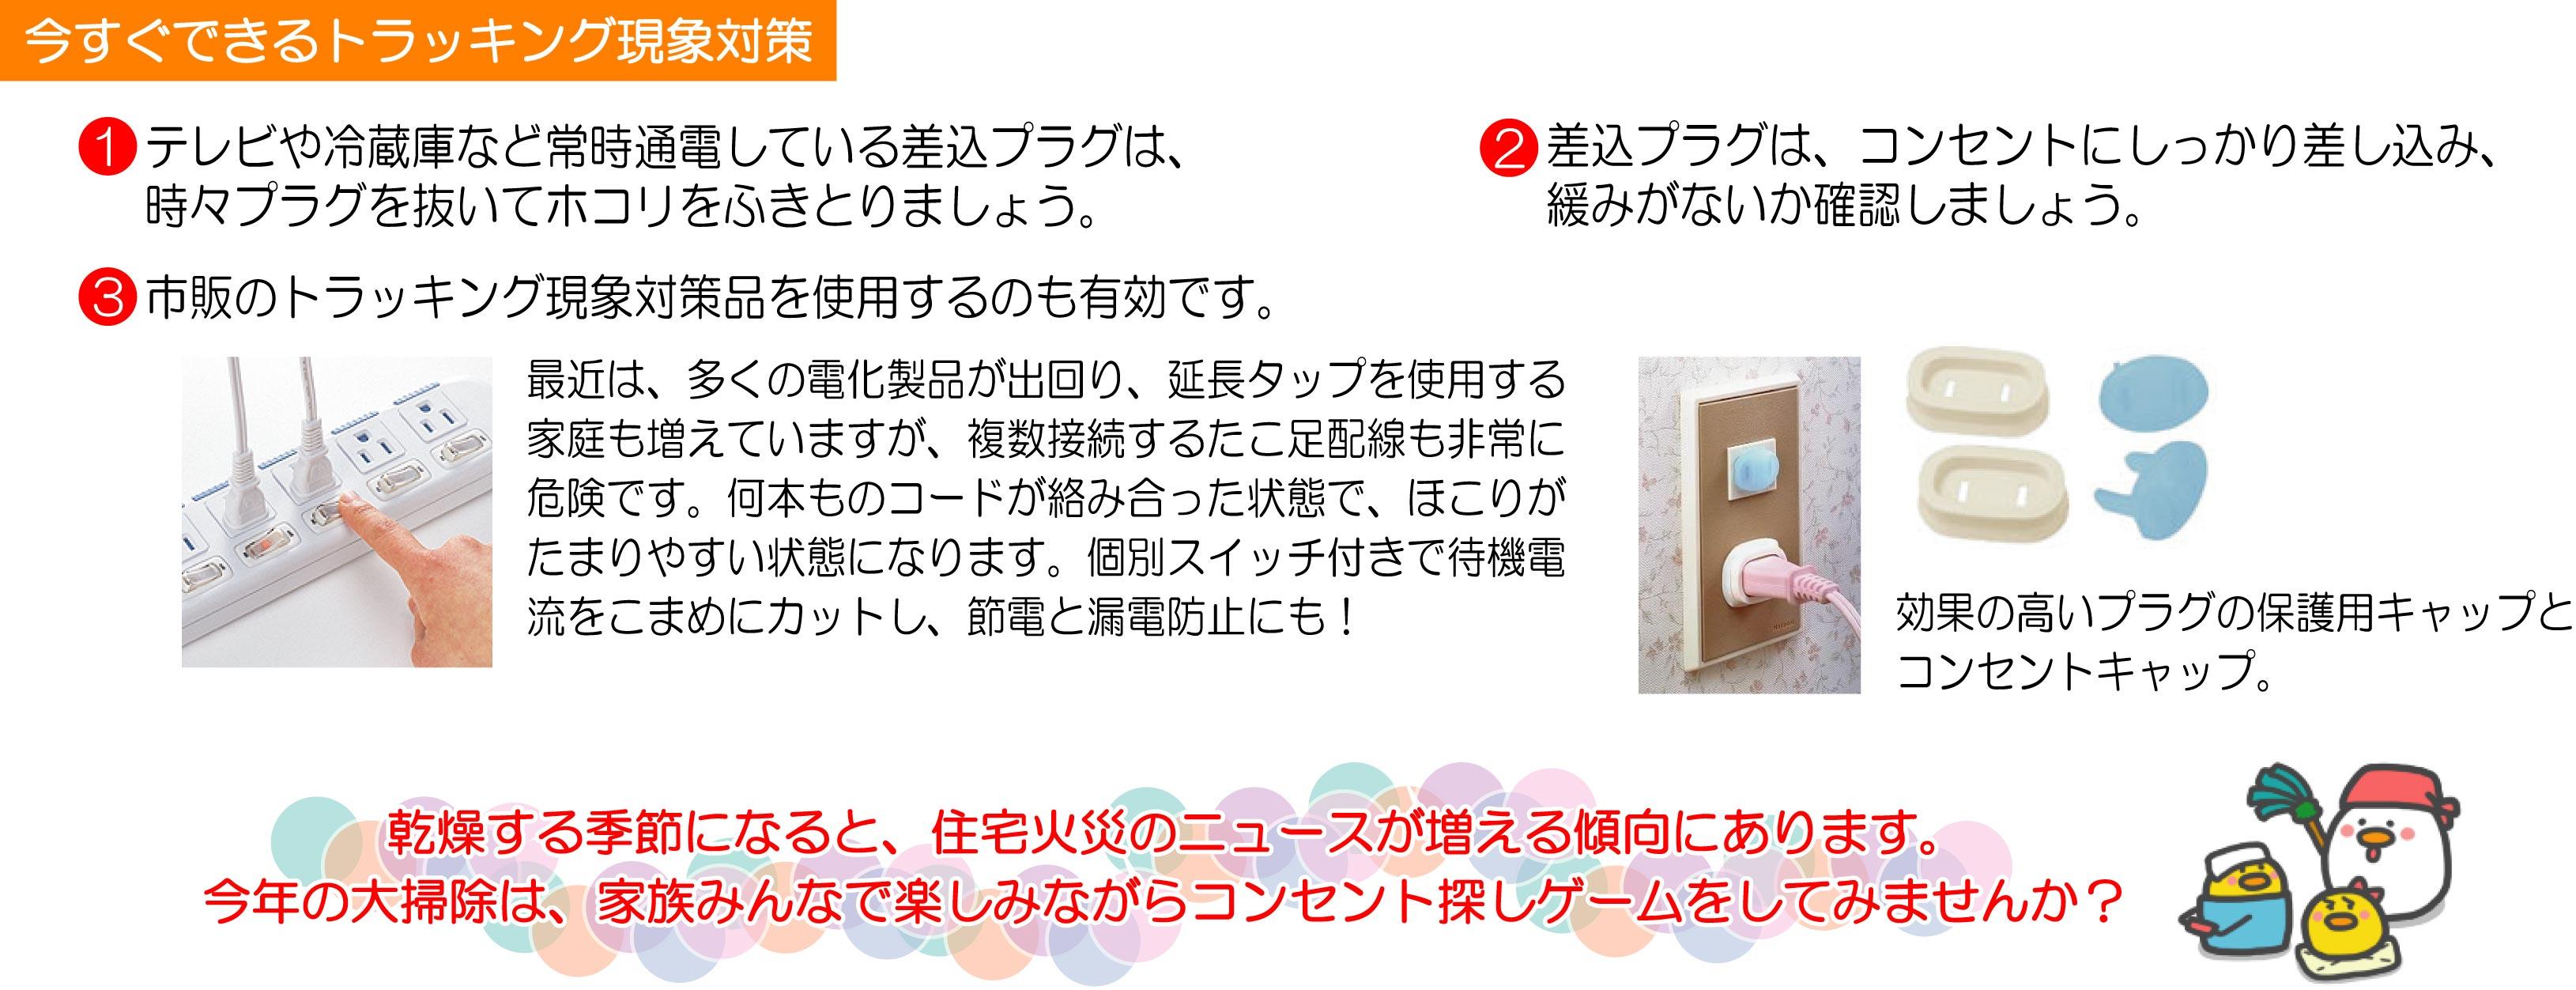 KuraSi-natu-sin79-14.jpg